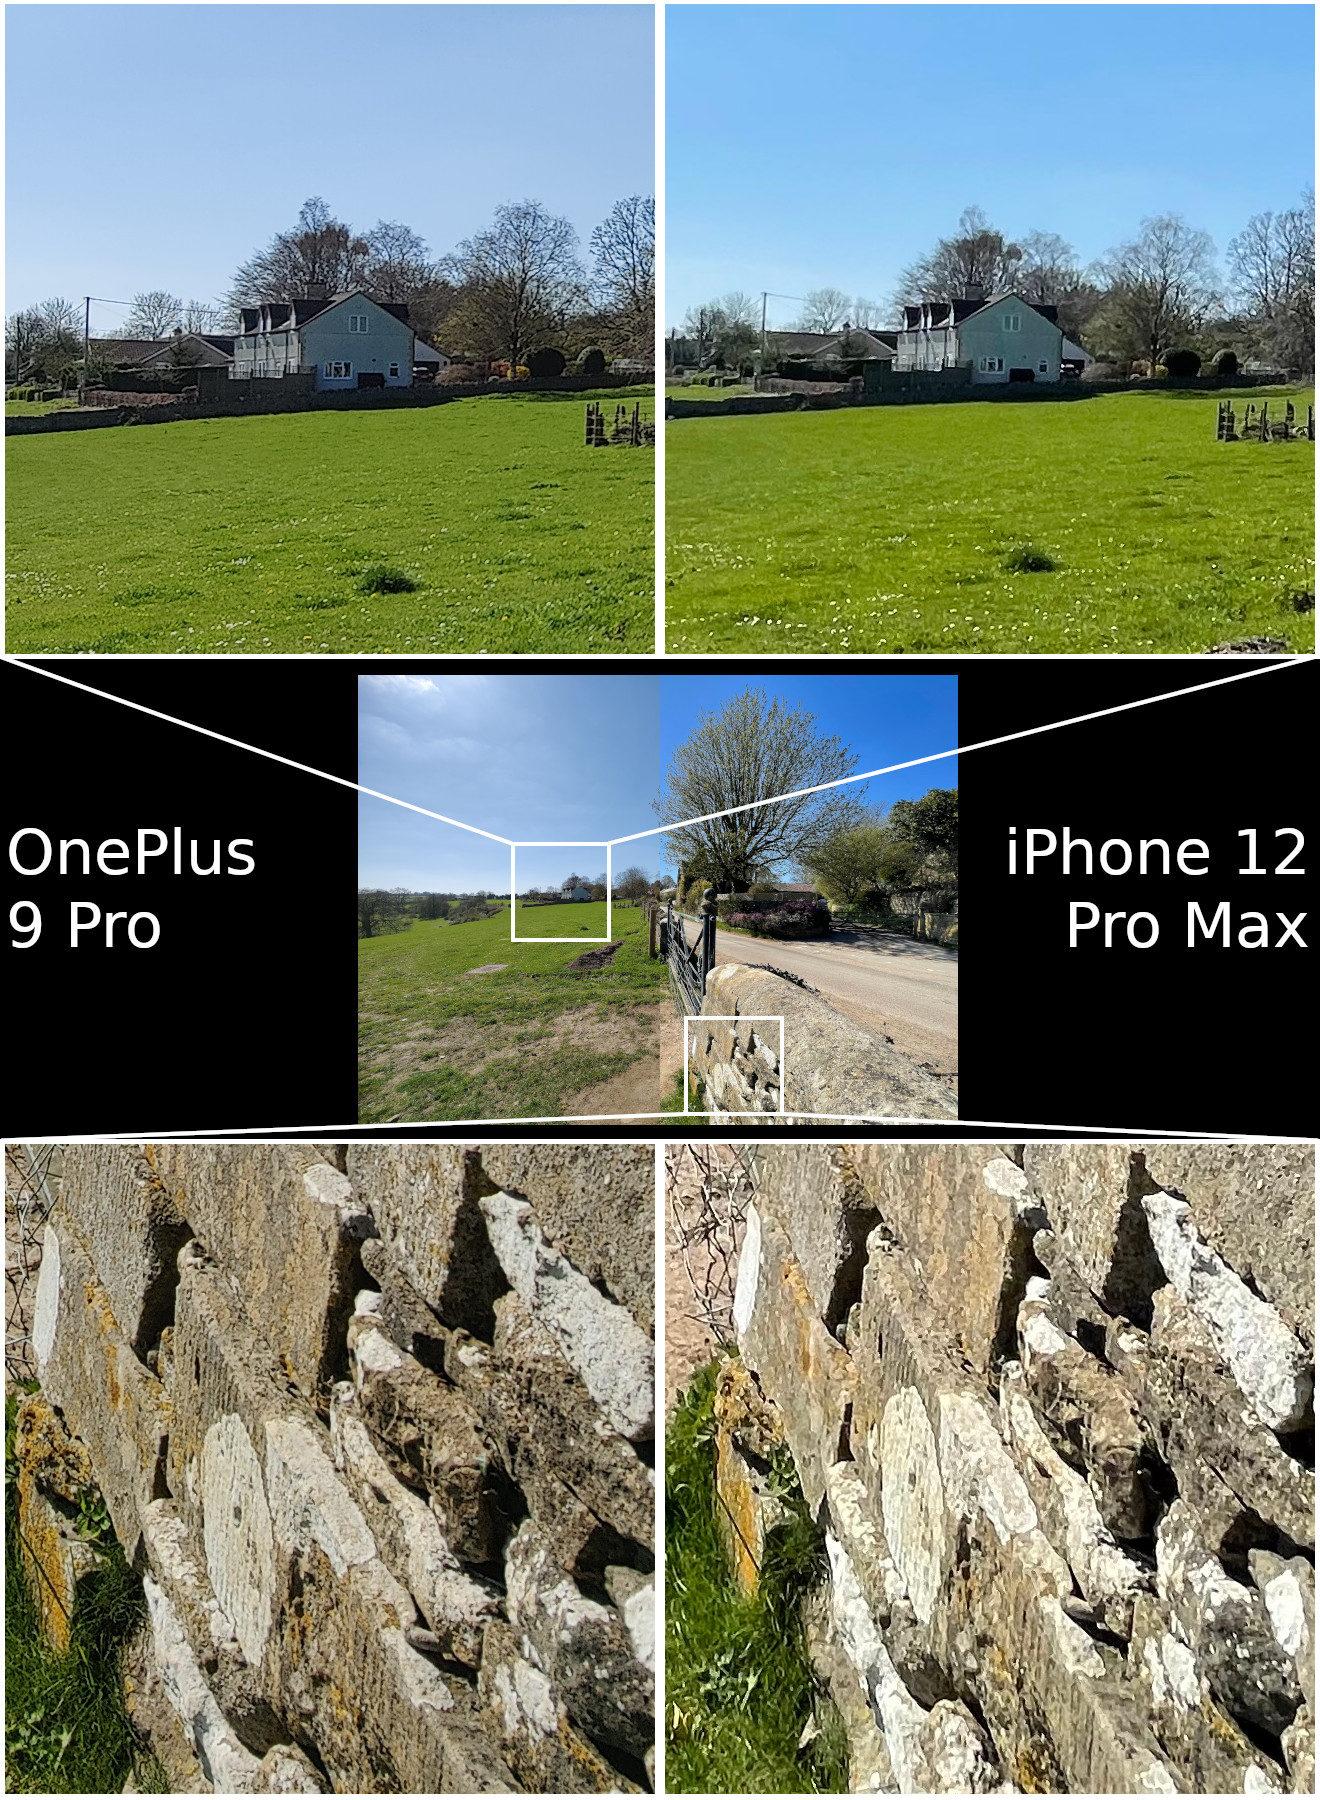 Camera shootout: OnePlus 9 Pro vs Apple iPhone 12 Pro Max